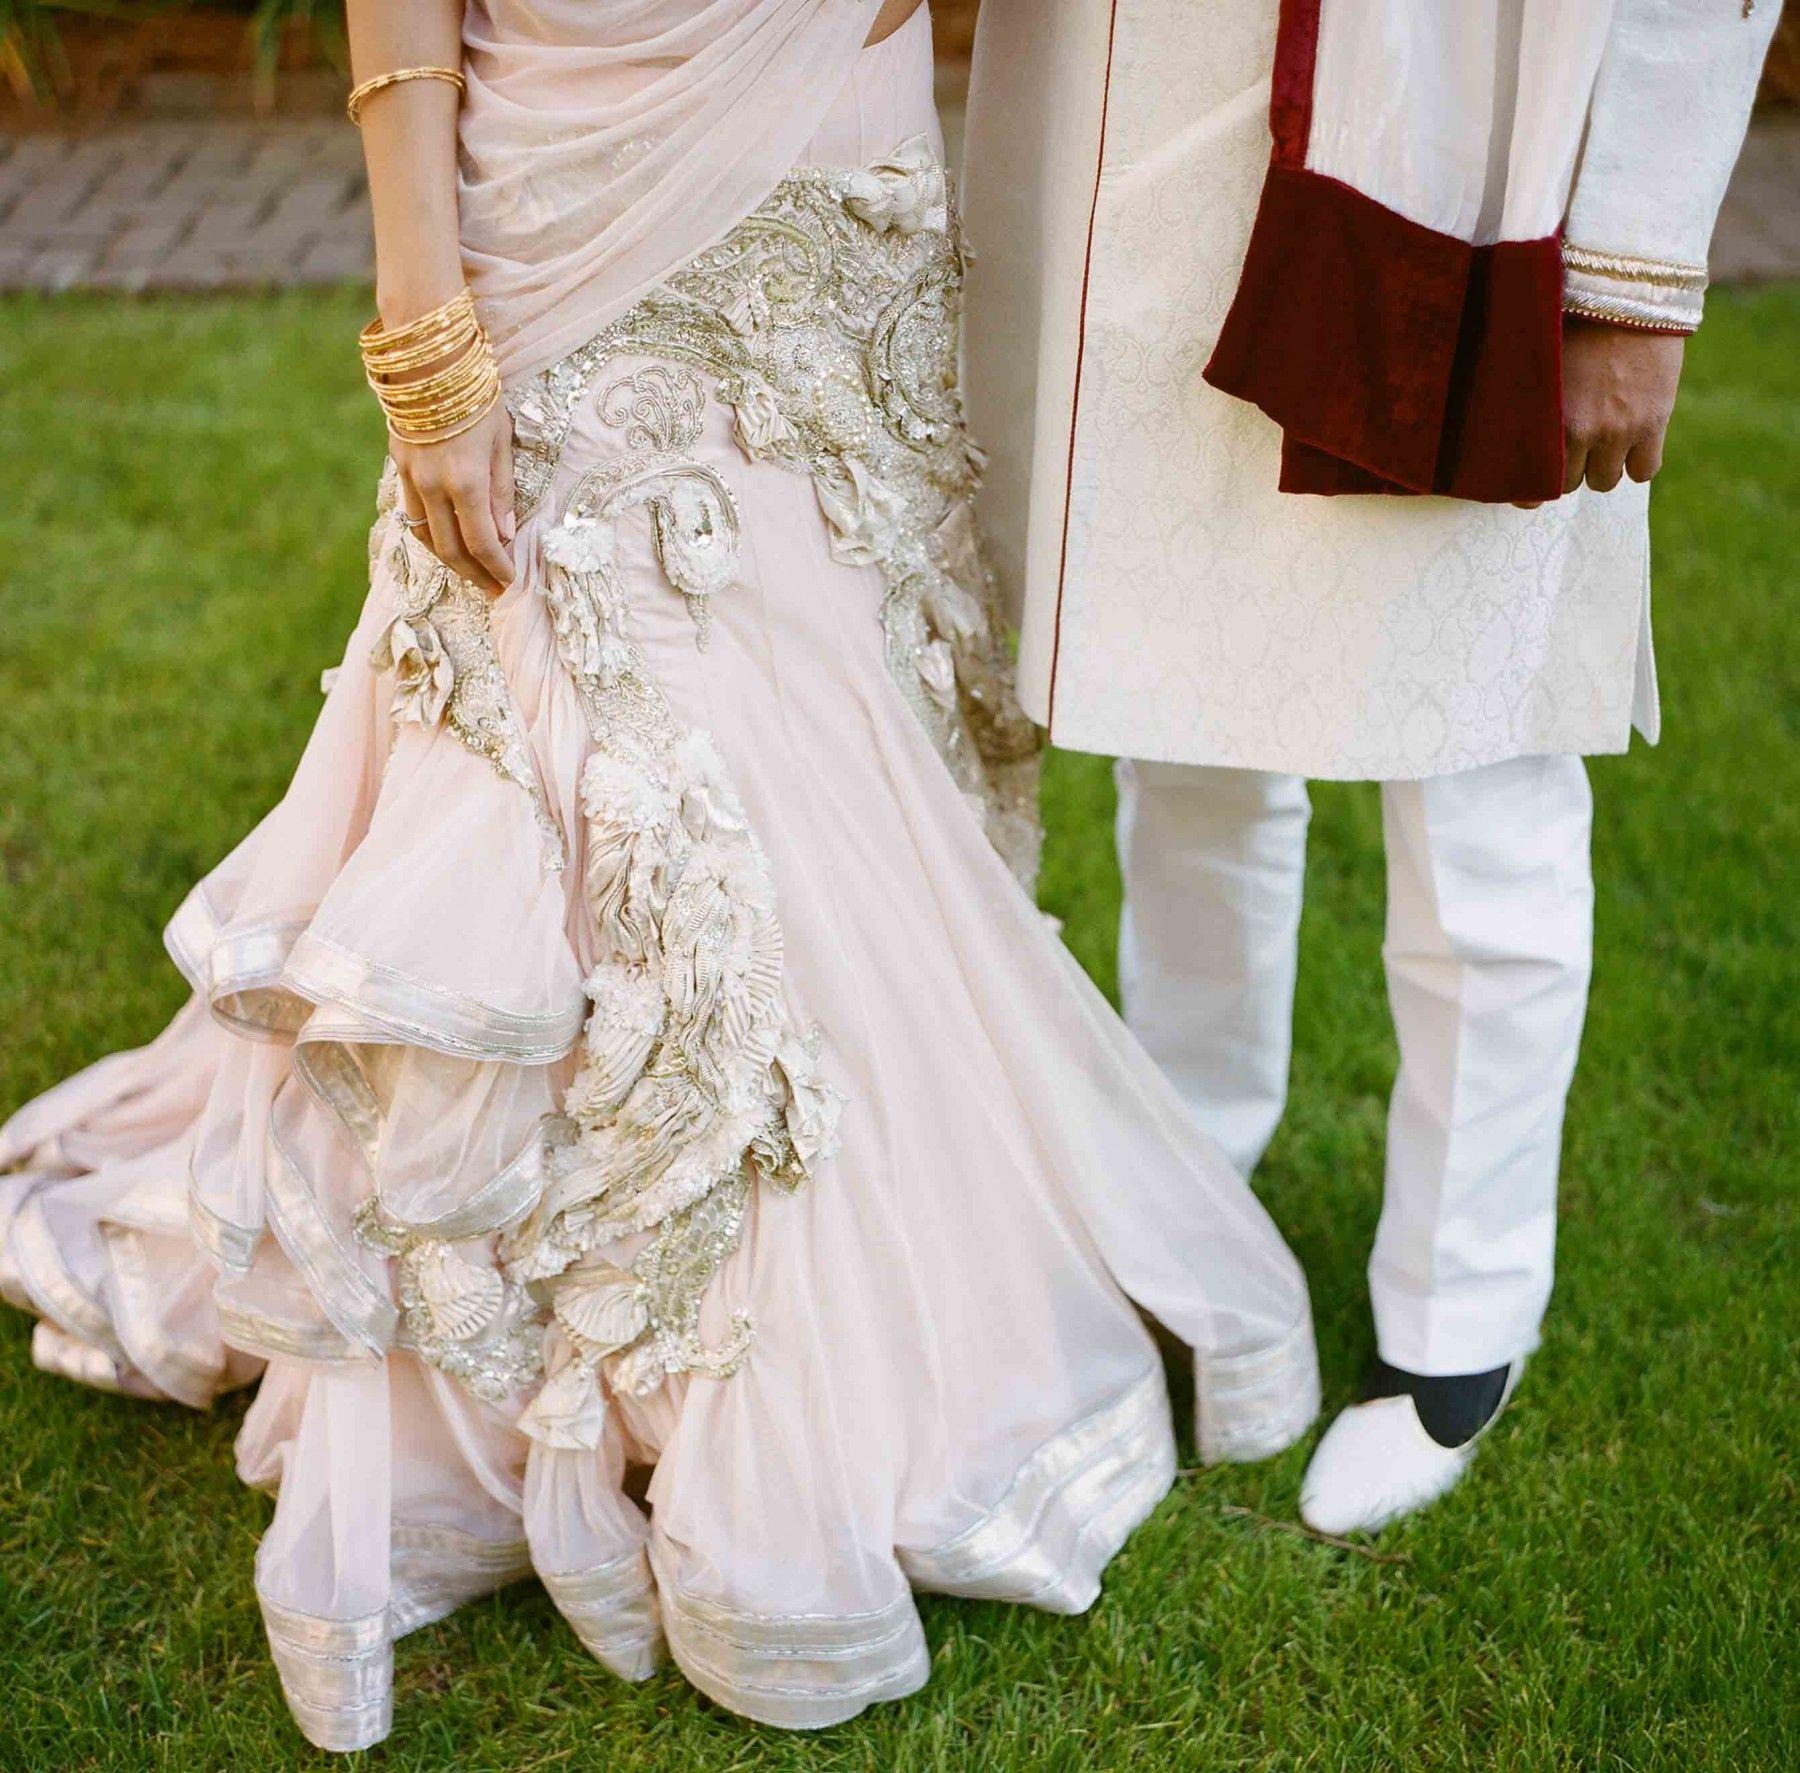 Hindu wedding dress  Hindu Heritage  Calder Clark   Luxury Wedding Design  Planning